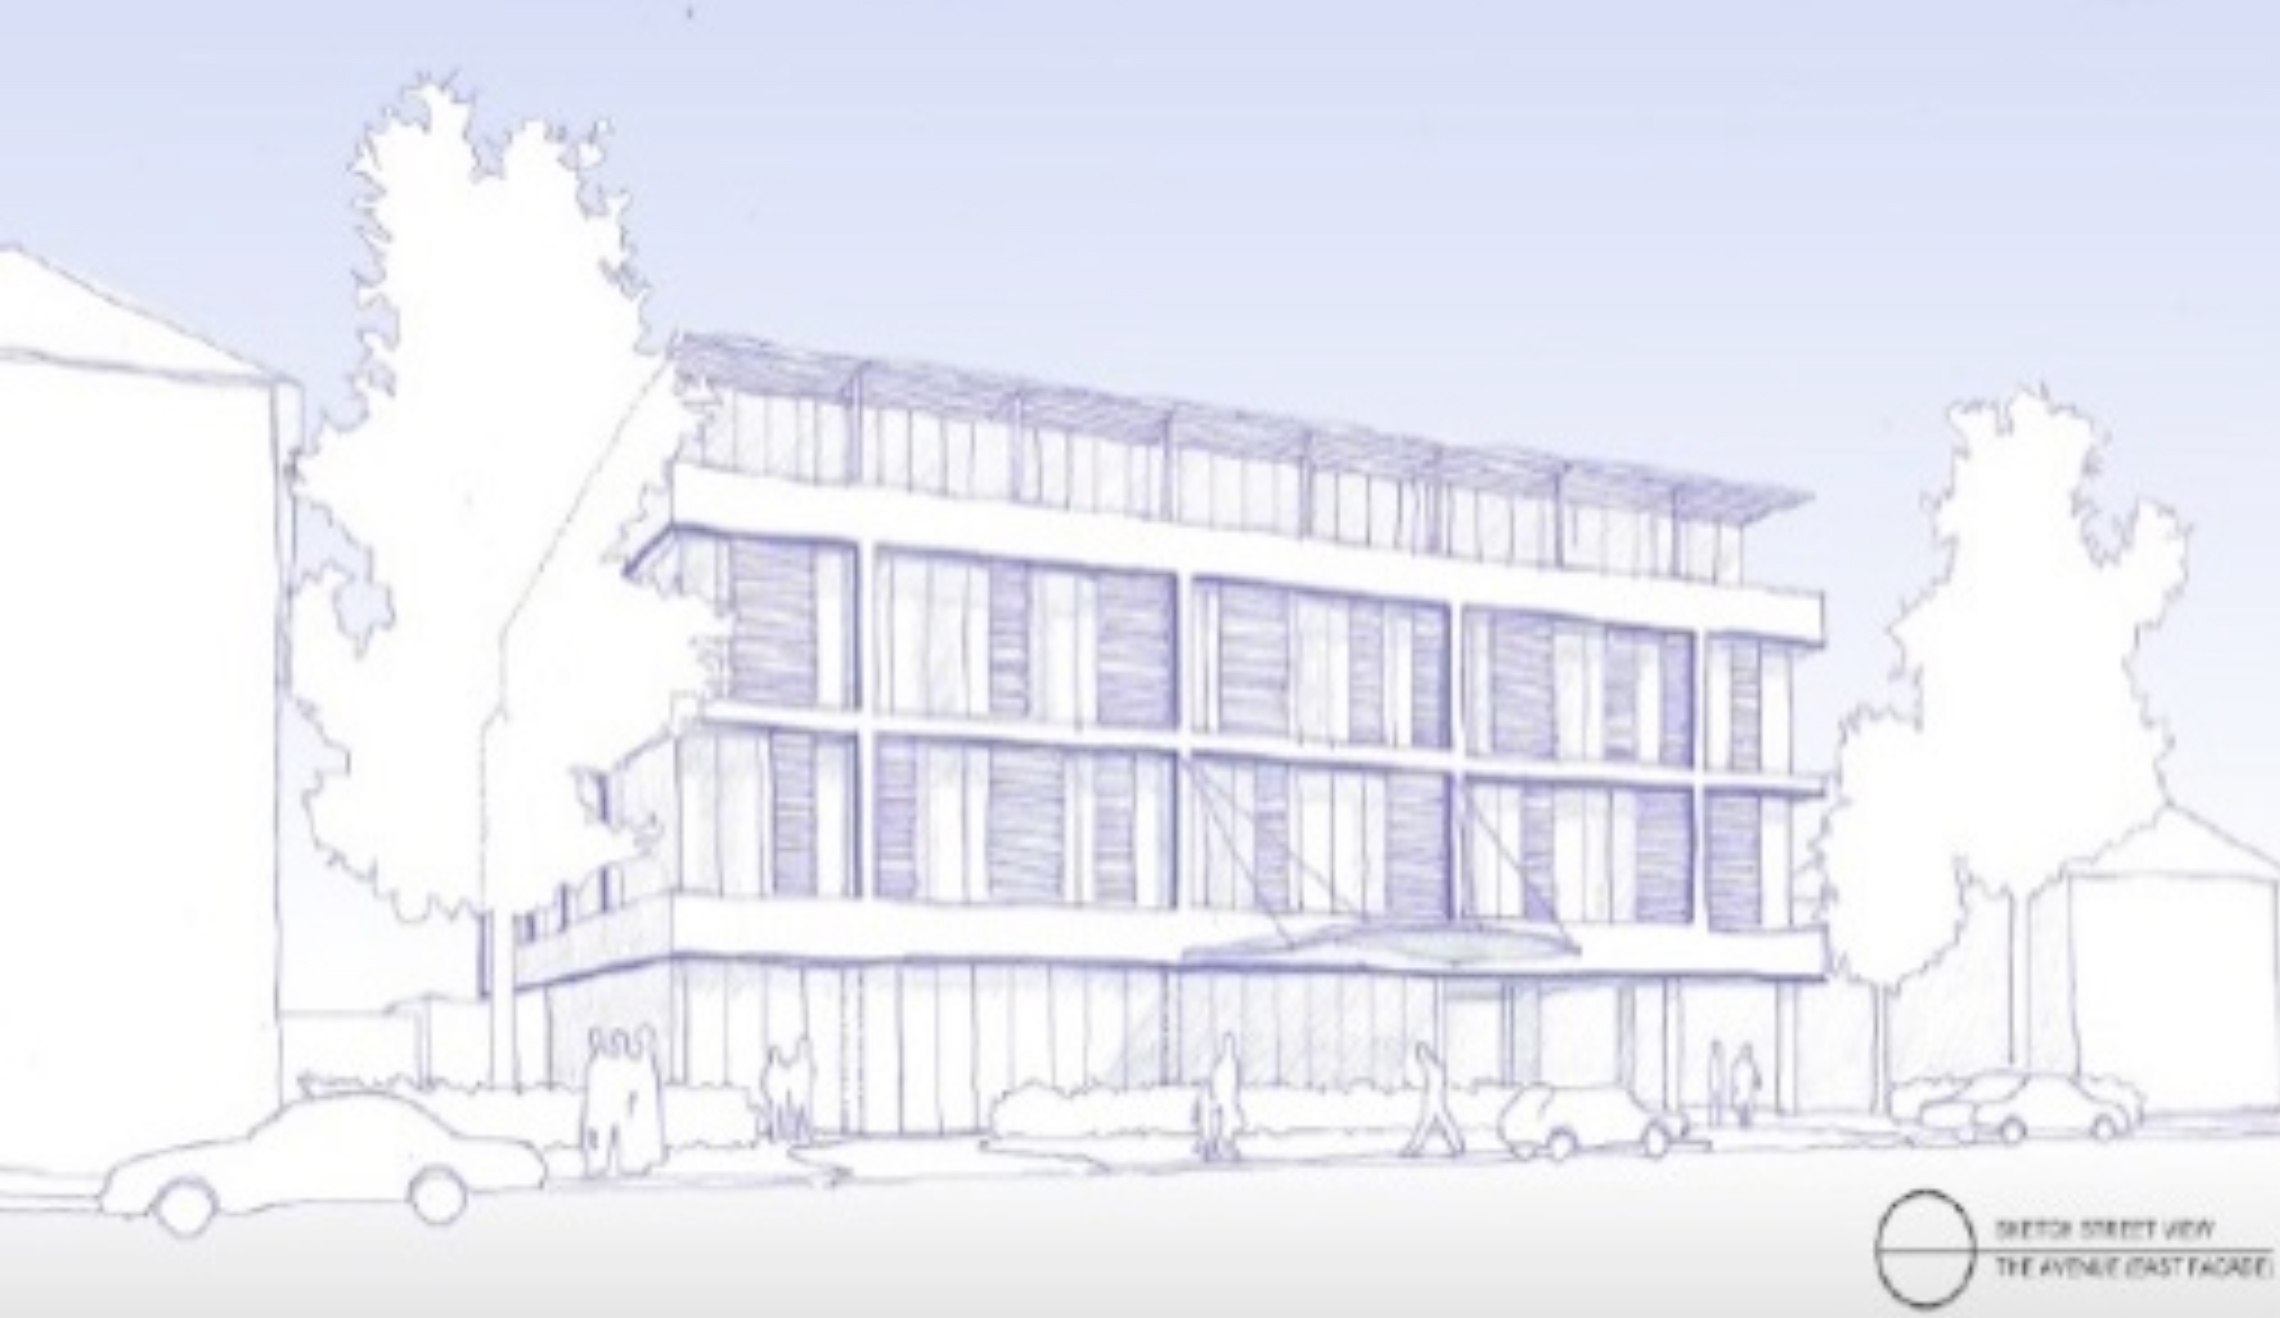 The Avenue Medical Centre